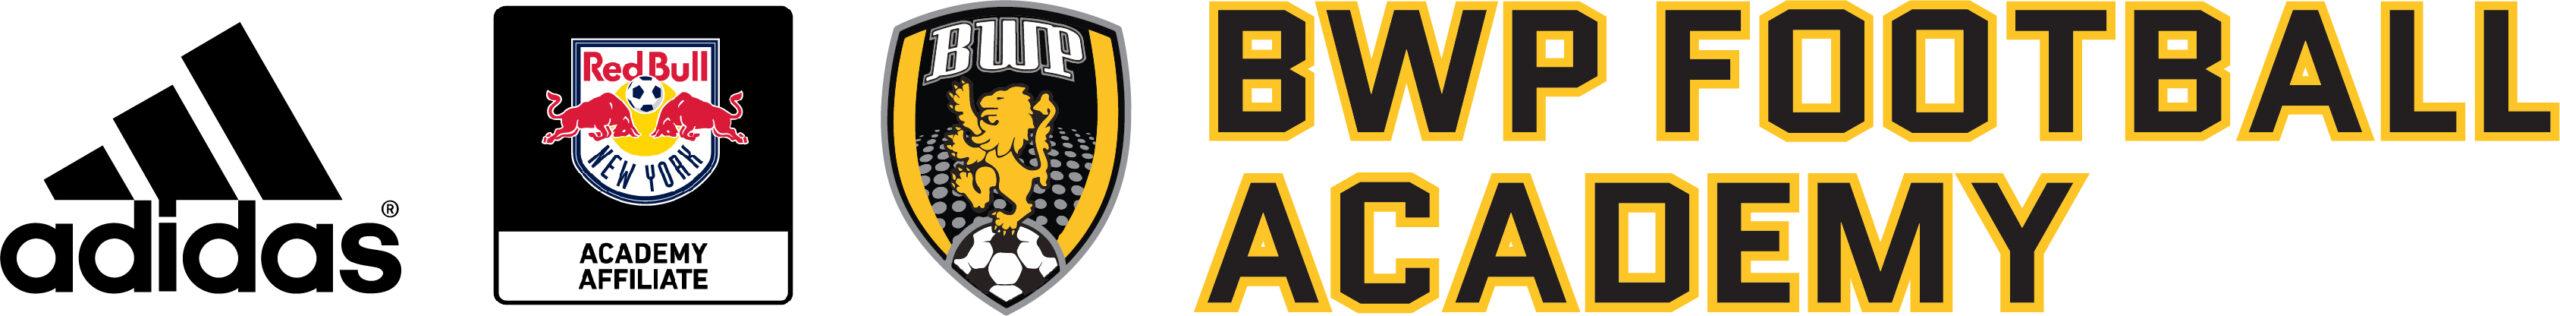 BWP Football Academy LogoFinal 2021